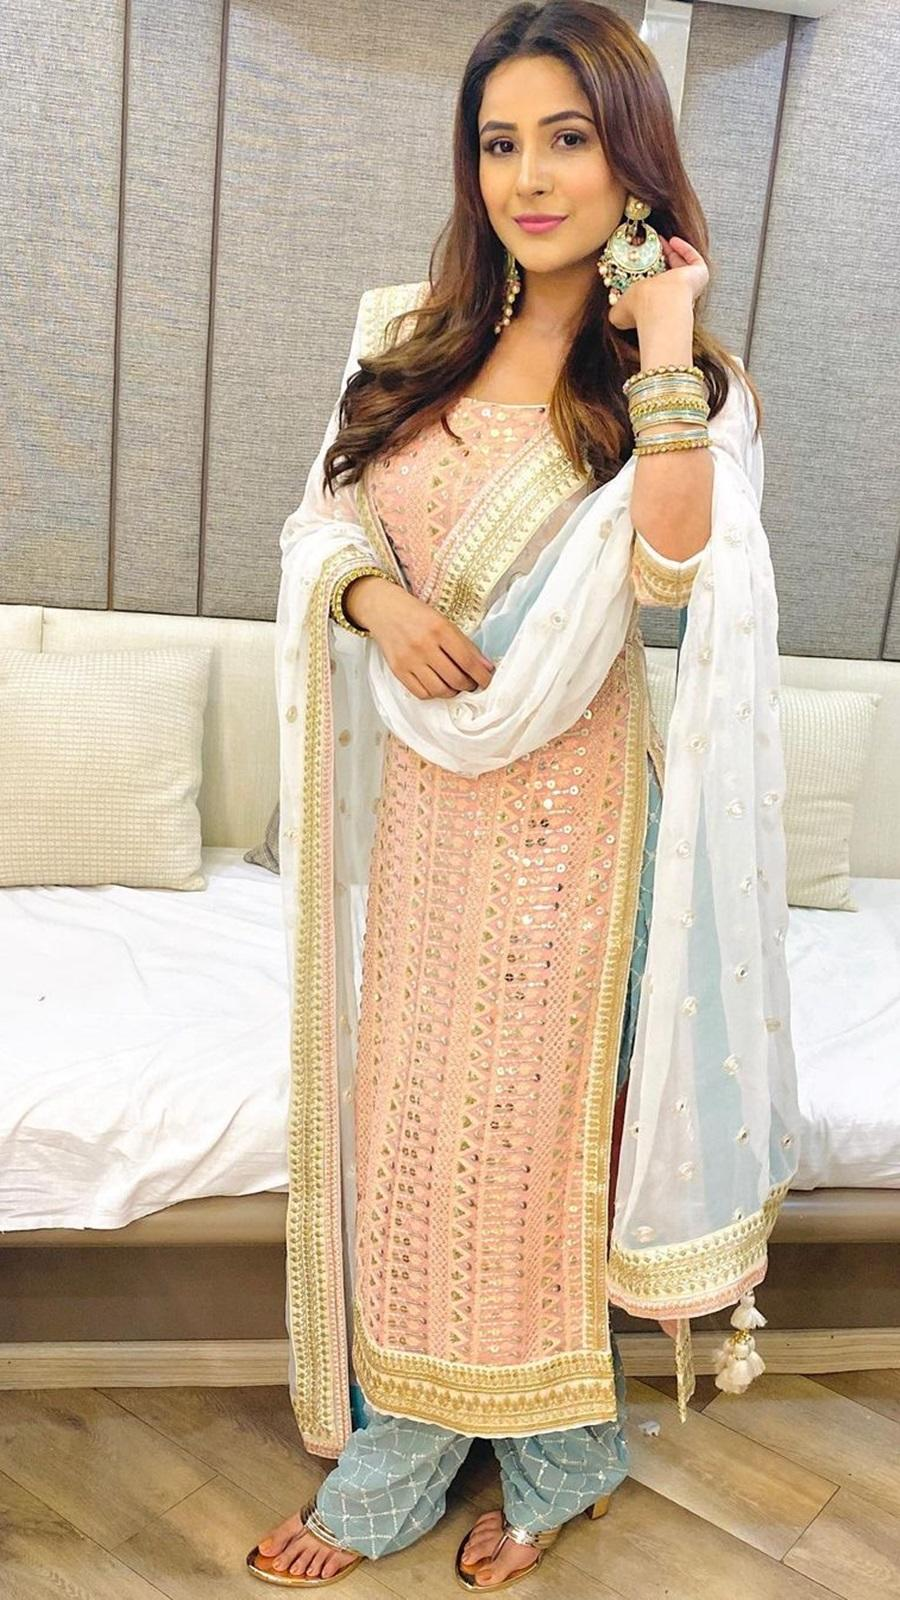 Bigg Boss 13 fame Shehnaaz Gill's stunning transformation | Times of India